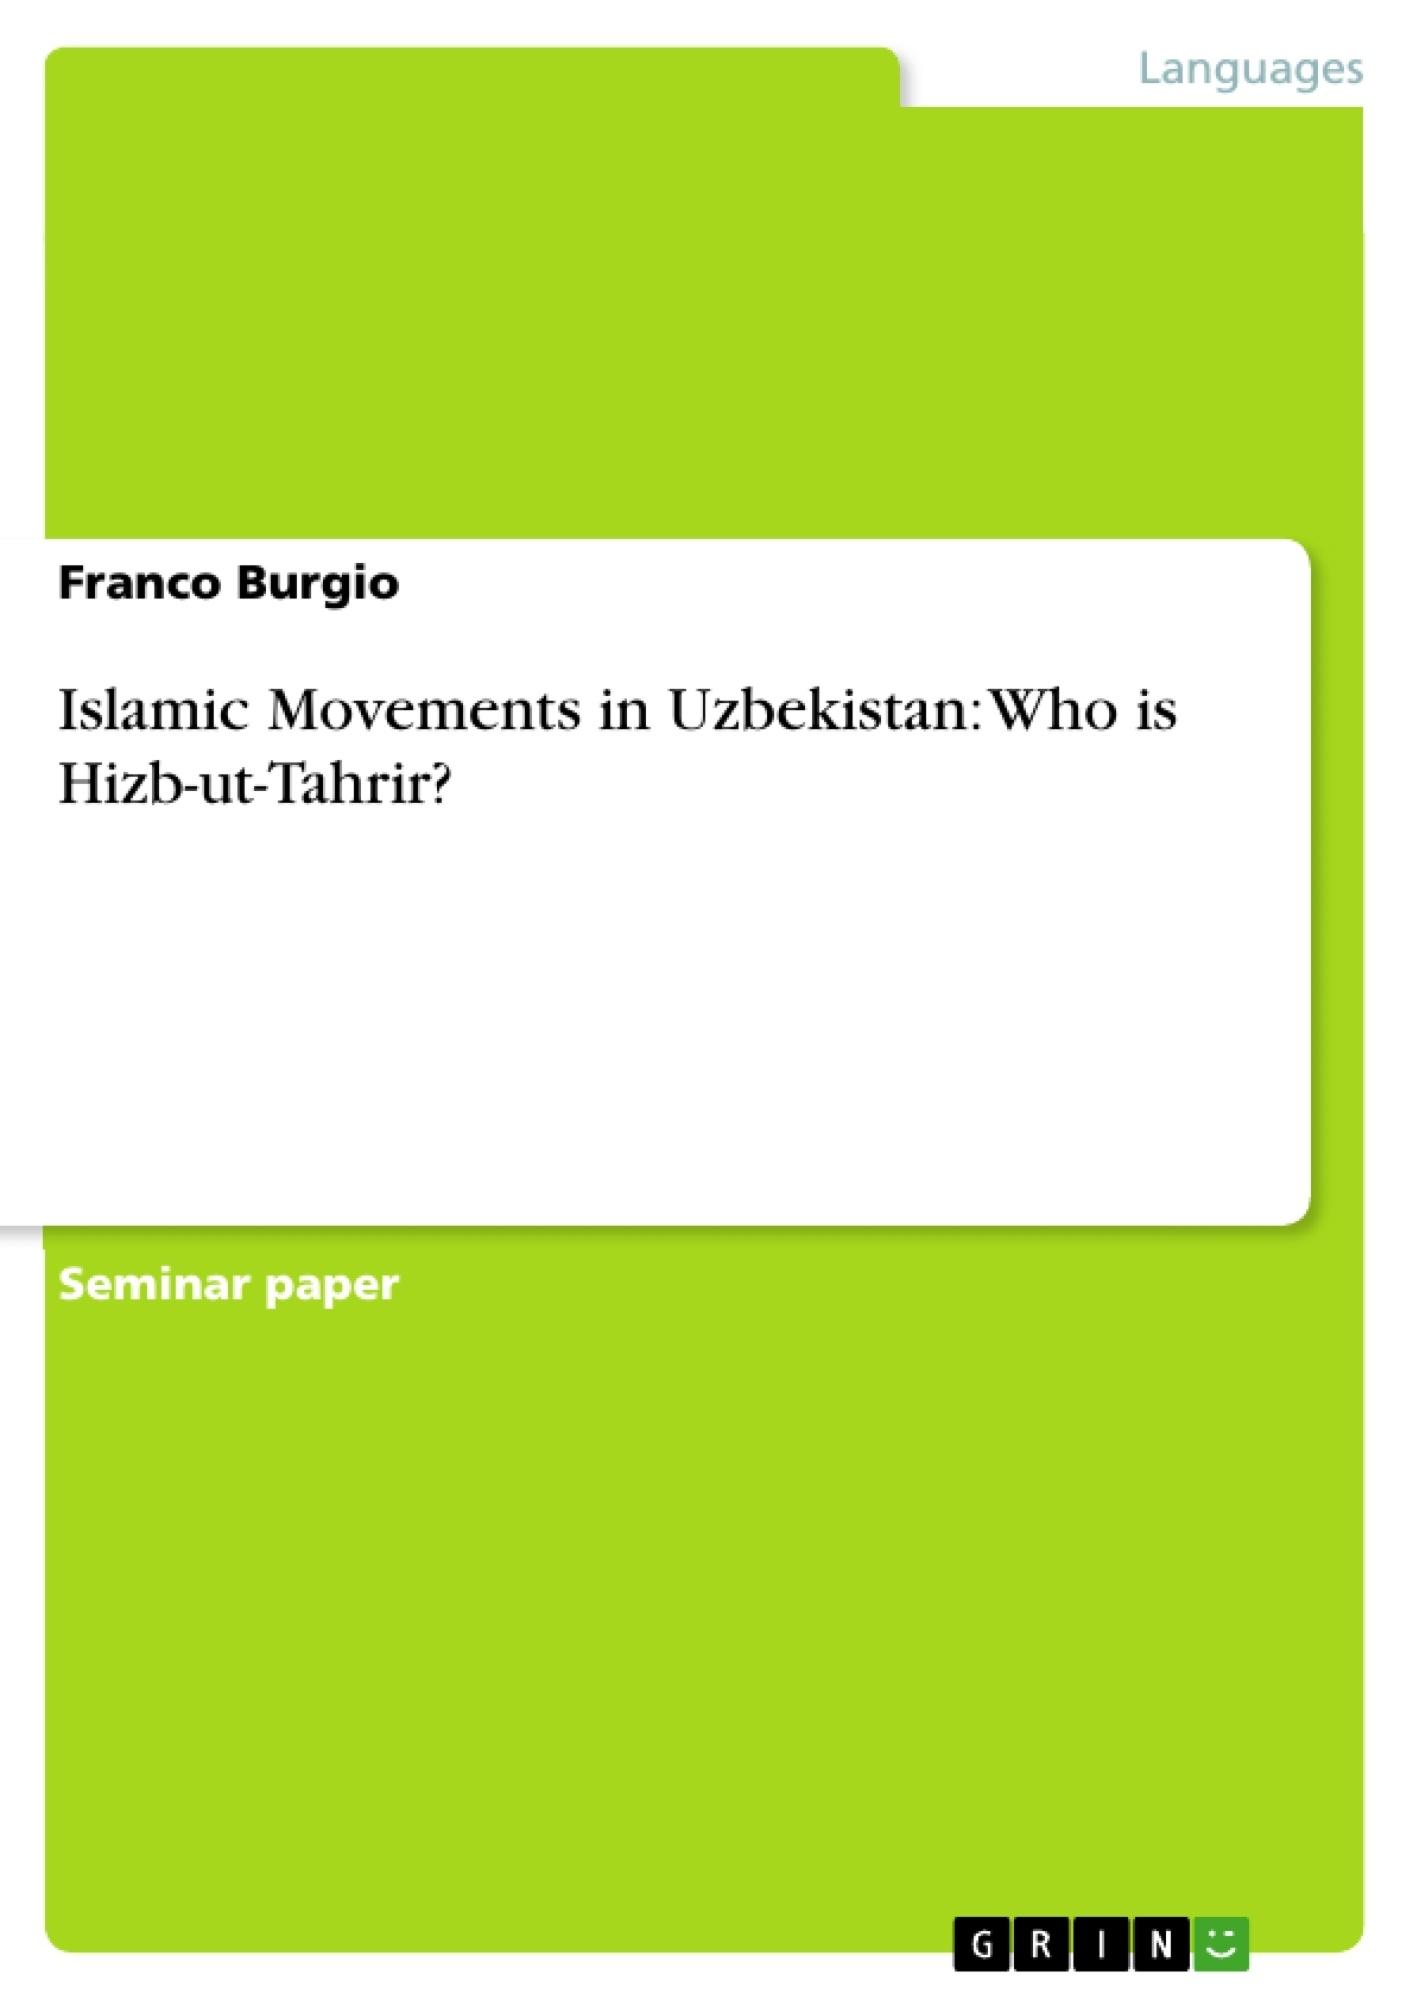 Title: Islamic Movements in Uzbekistan: Who is Hizb-ut-Tahrir?